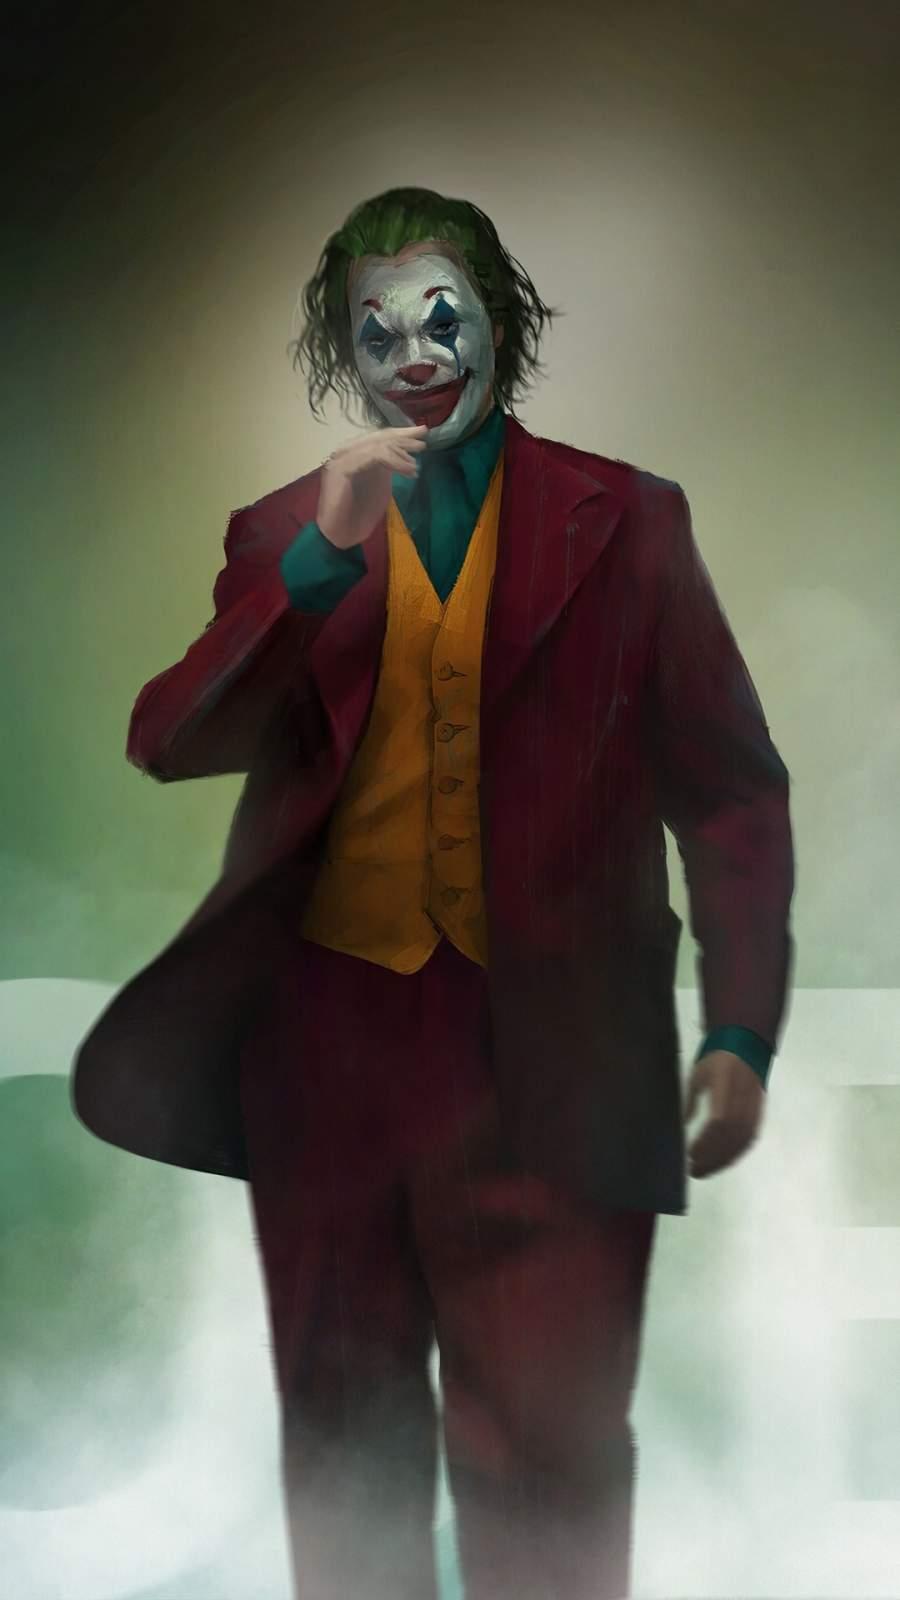 Joker Walking Art iPhone Wallpaper